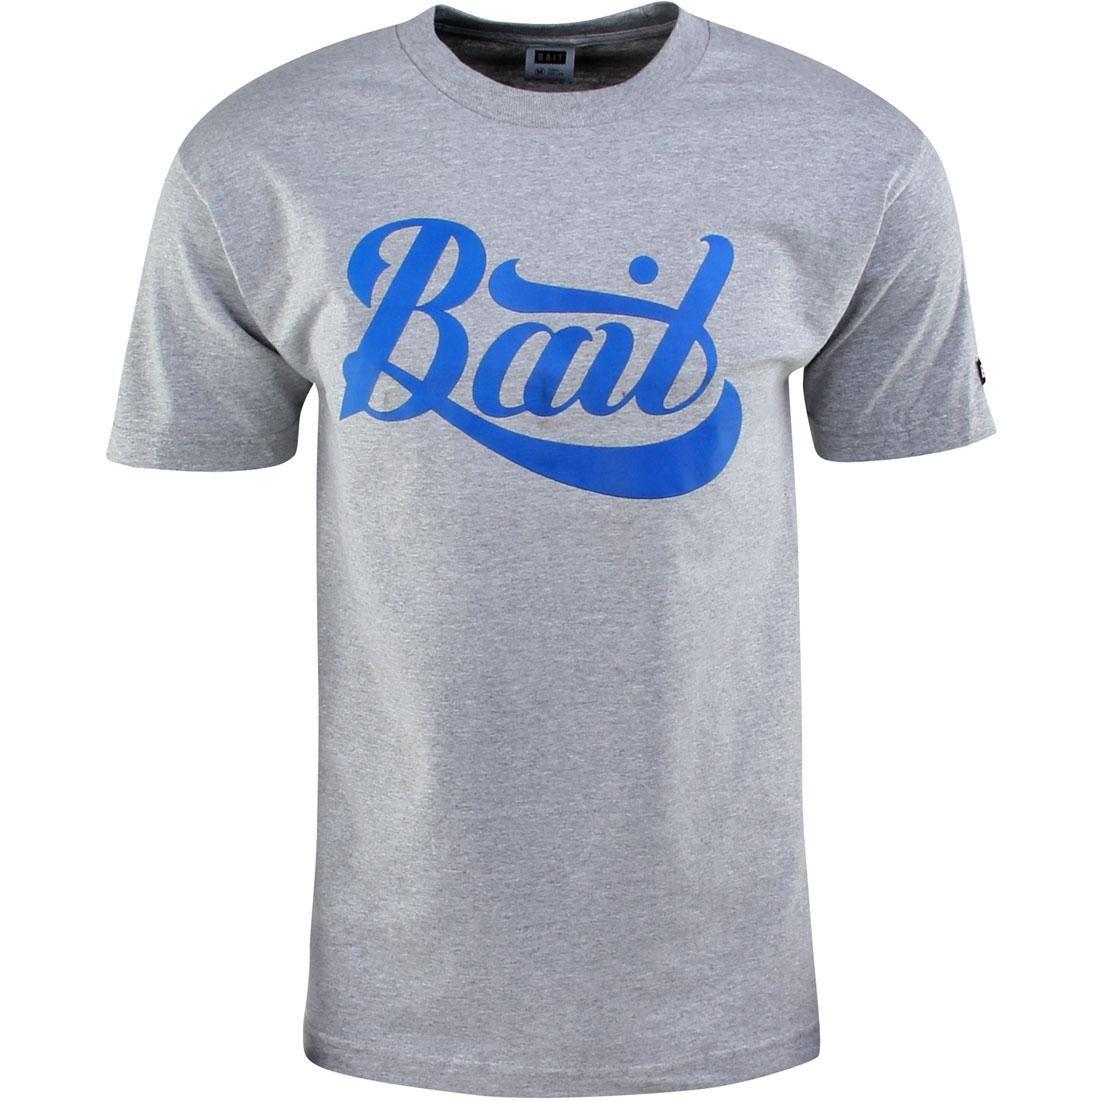 BAIT Script Logo Tee (gray / heather gray / blue)